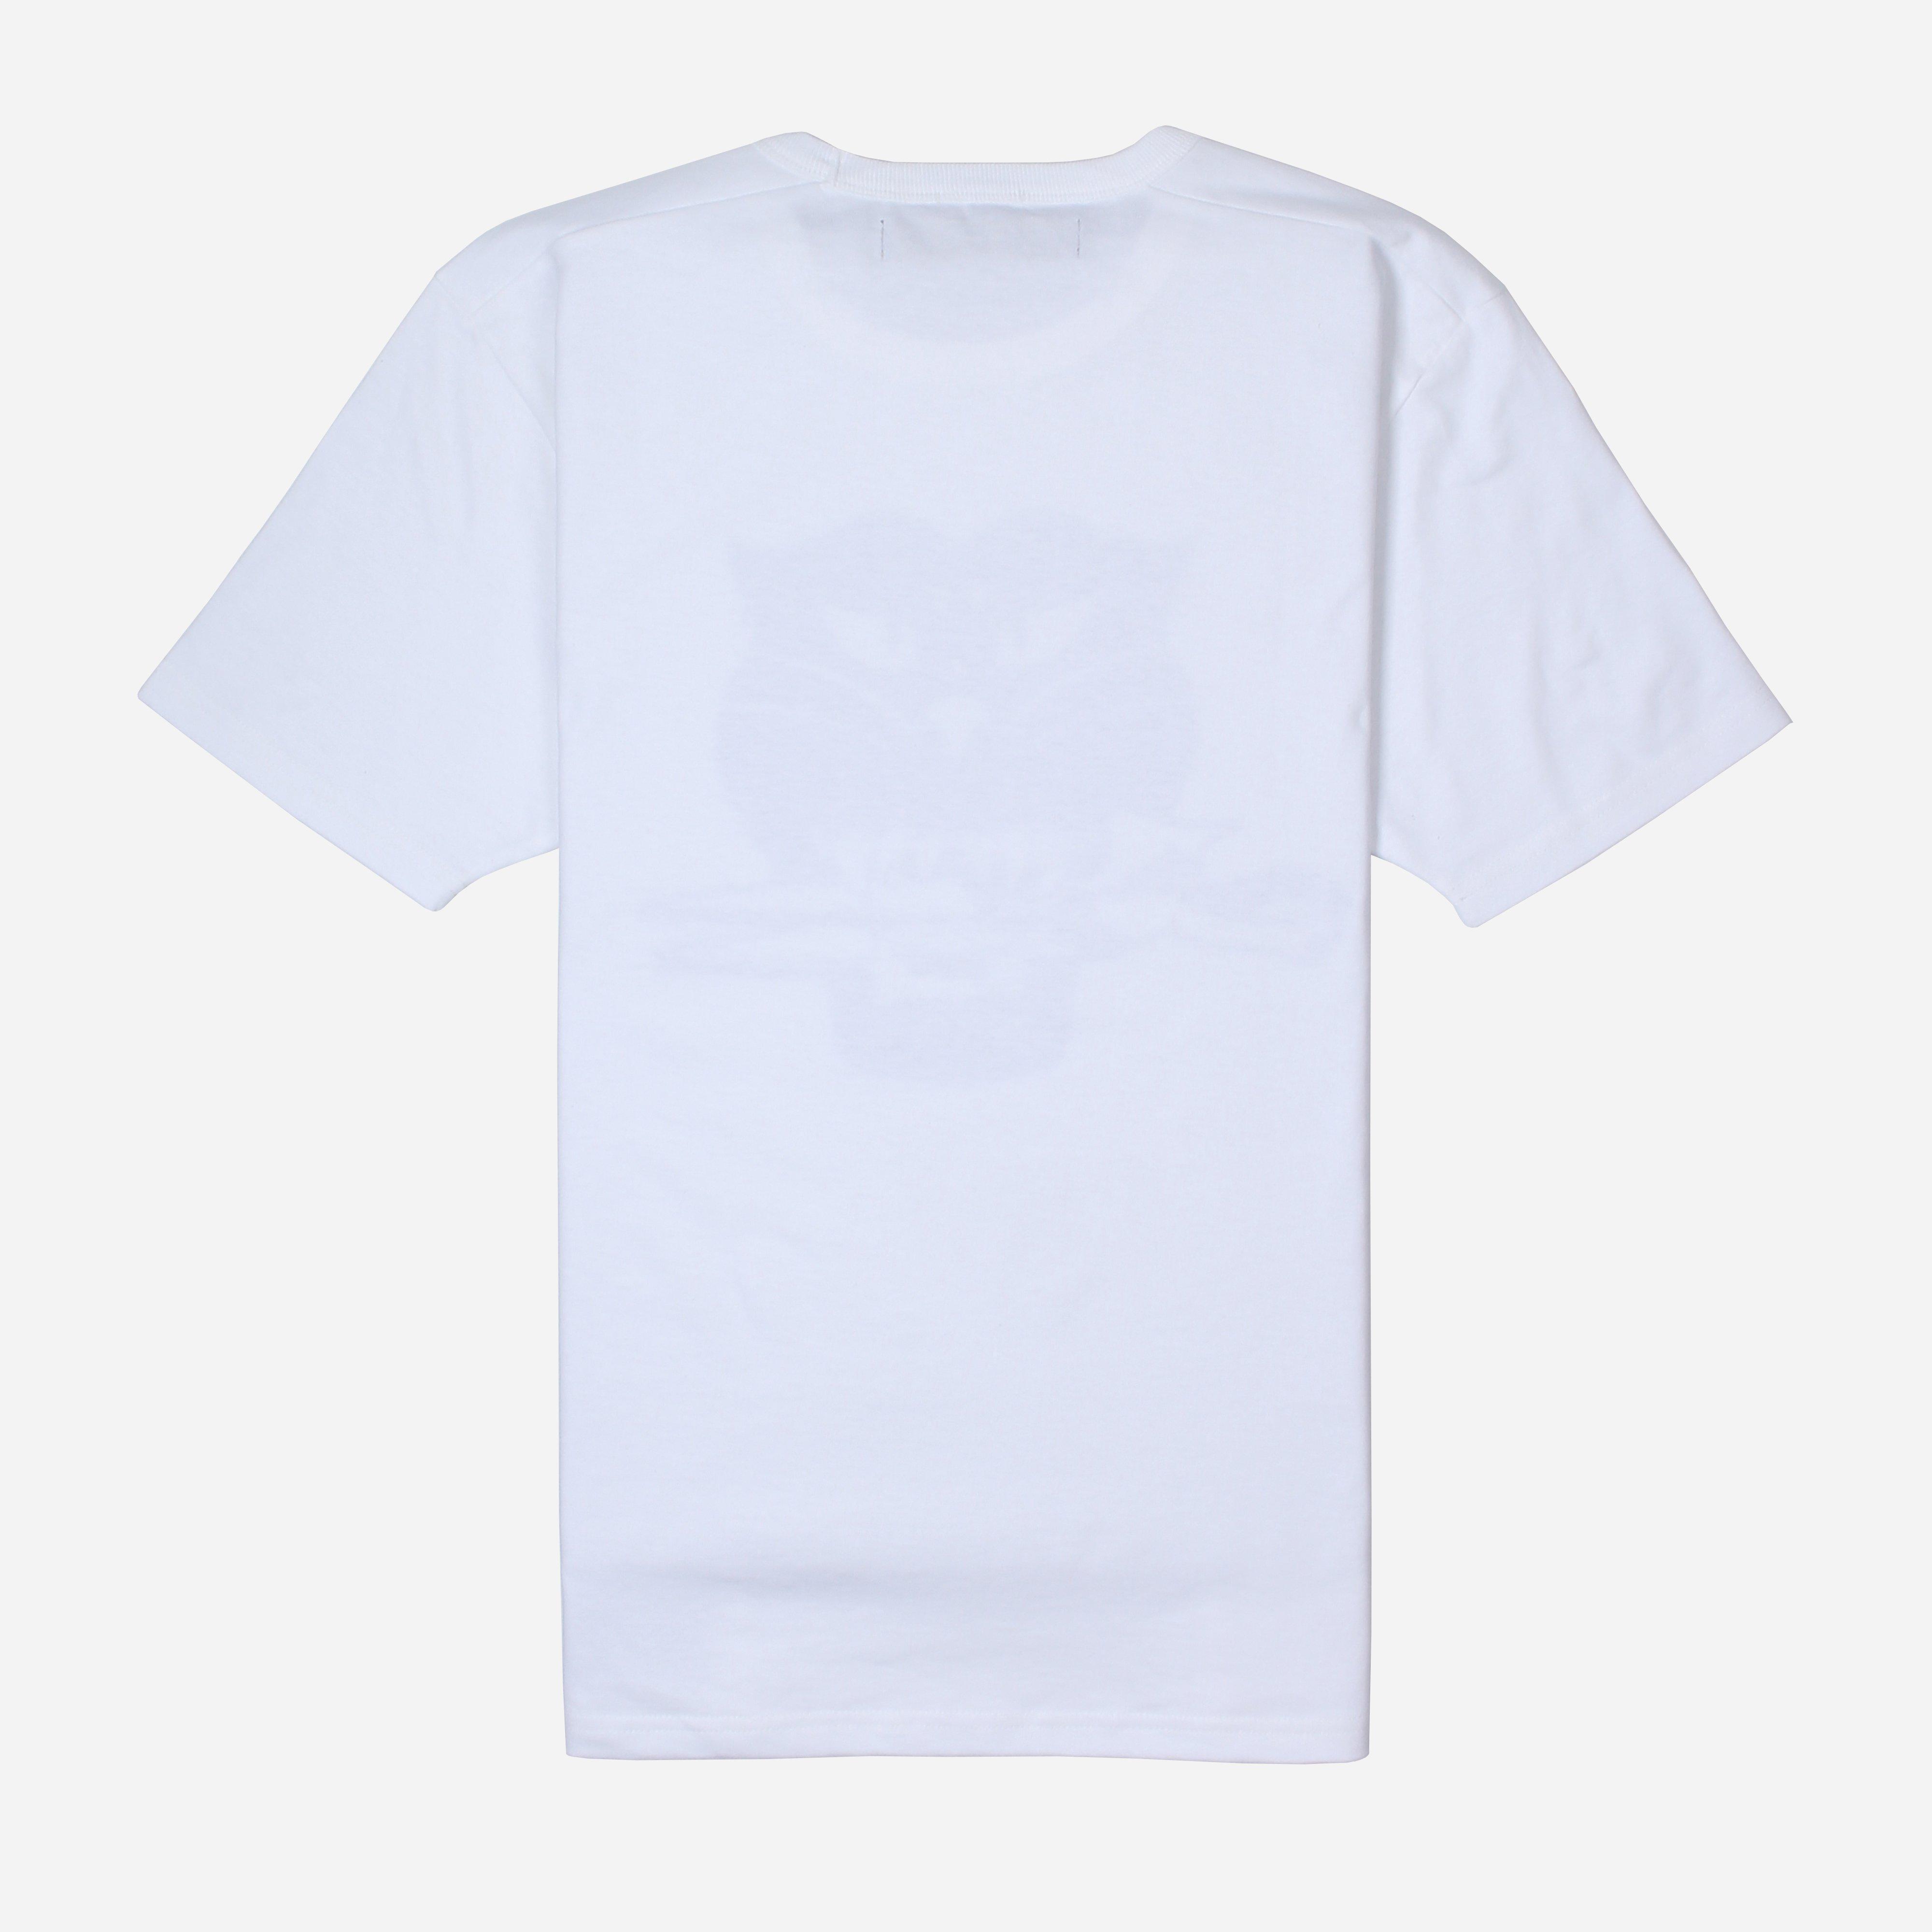 0d7b6164a7cc ... Denham Black Cat T-shirt for Men - Lyst. View fullscreen